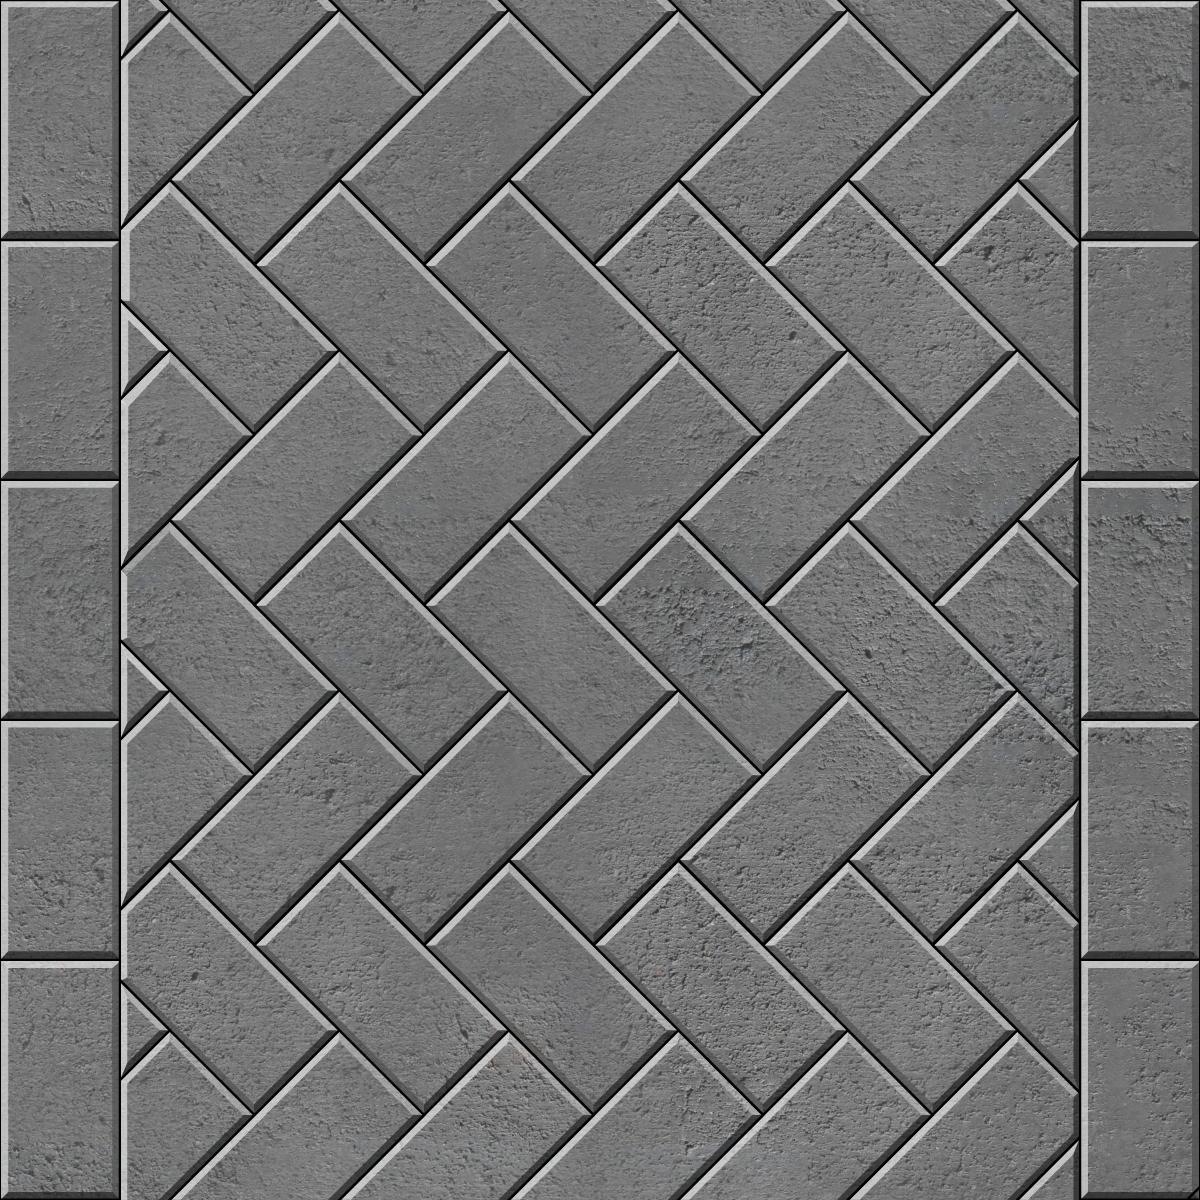 45 Herringbone with flat header course brick